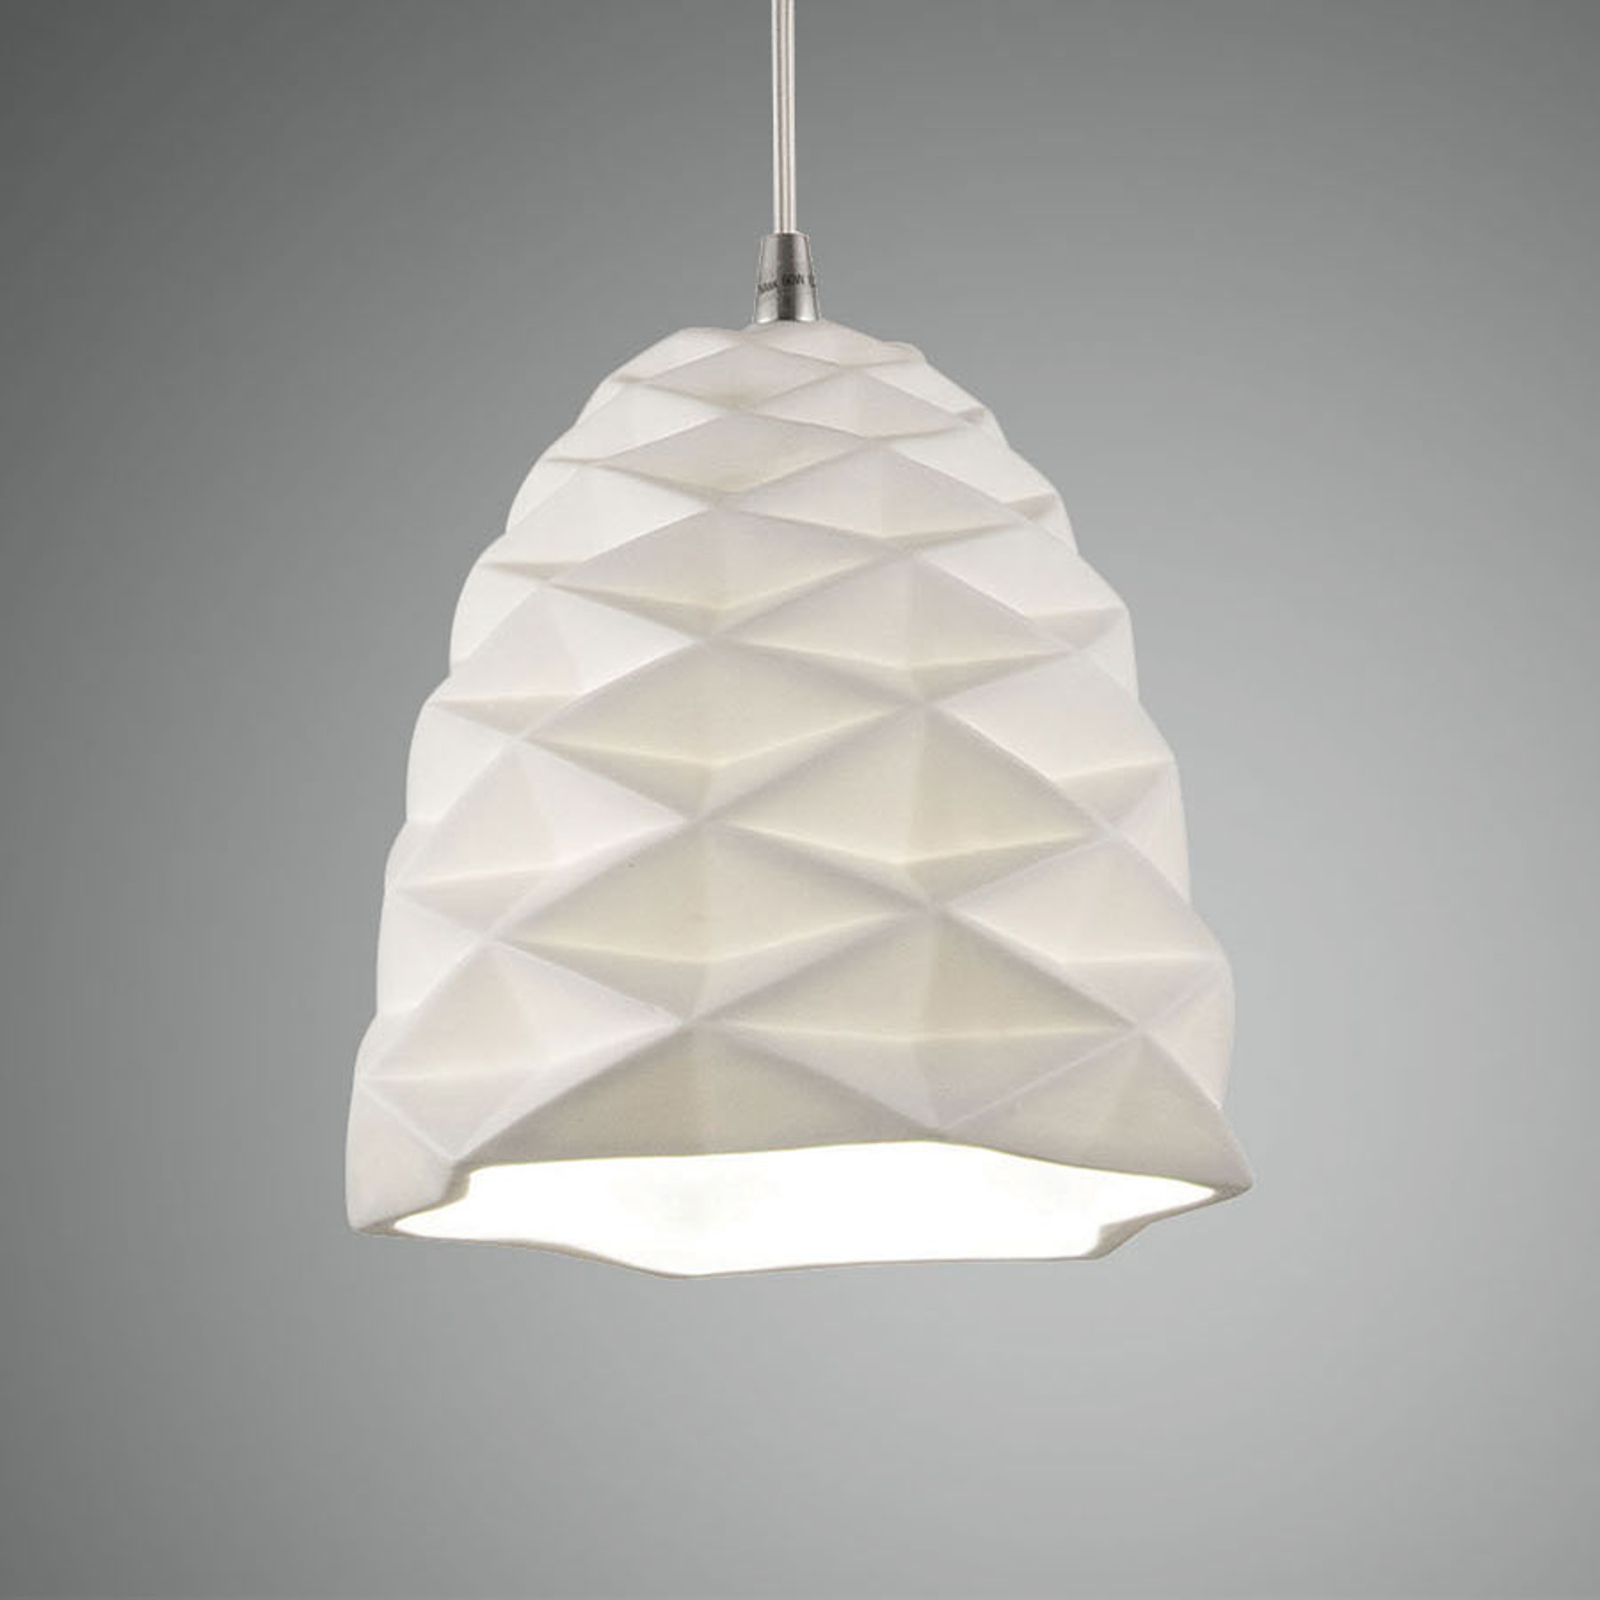 Hanglamp Duchessa van keramiek, Ø 20 cm